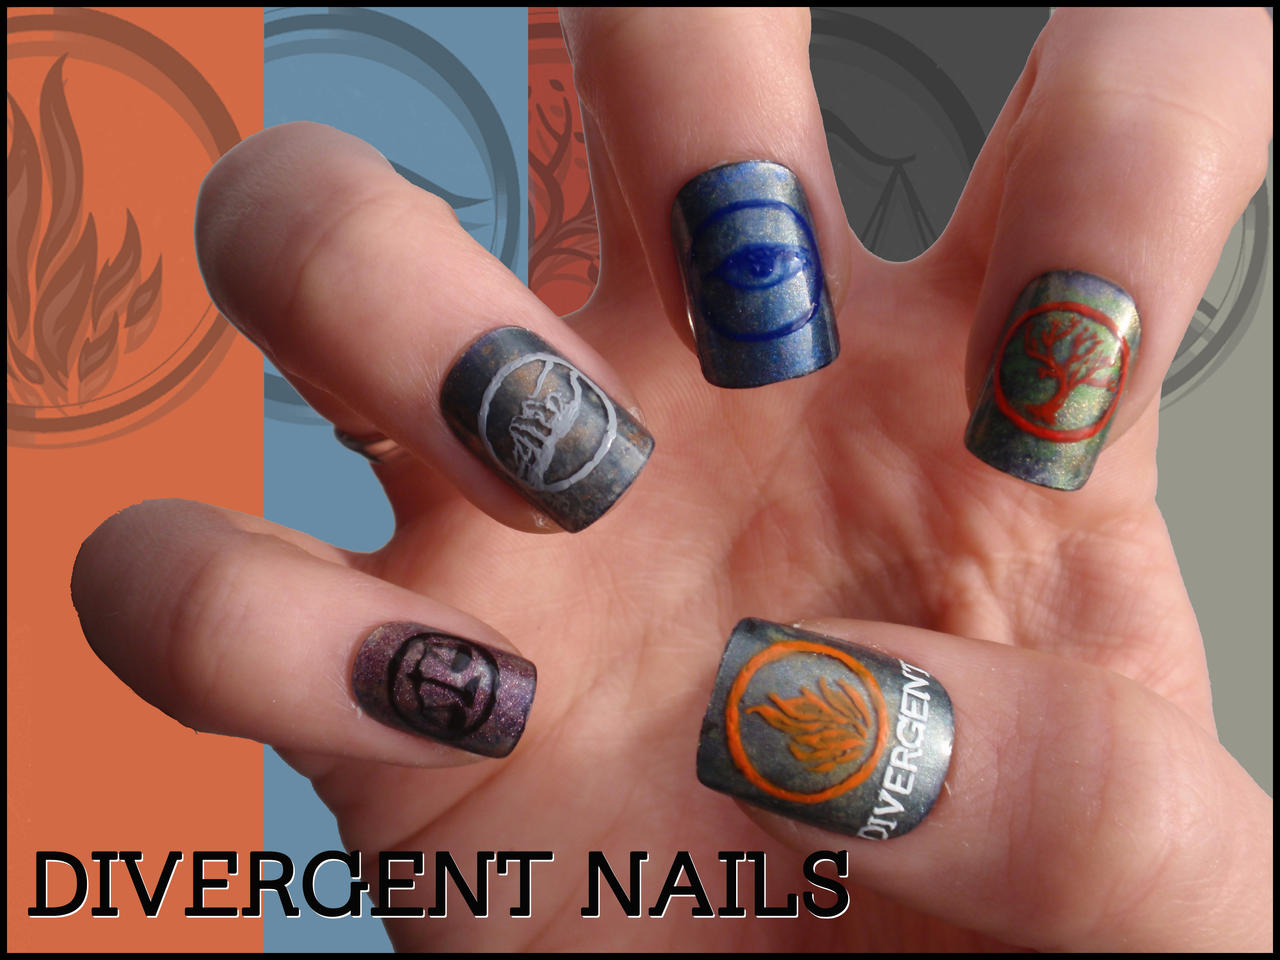 Geek-Nails DeviantArt Gallery